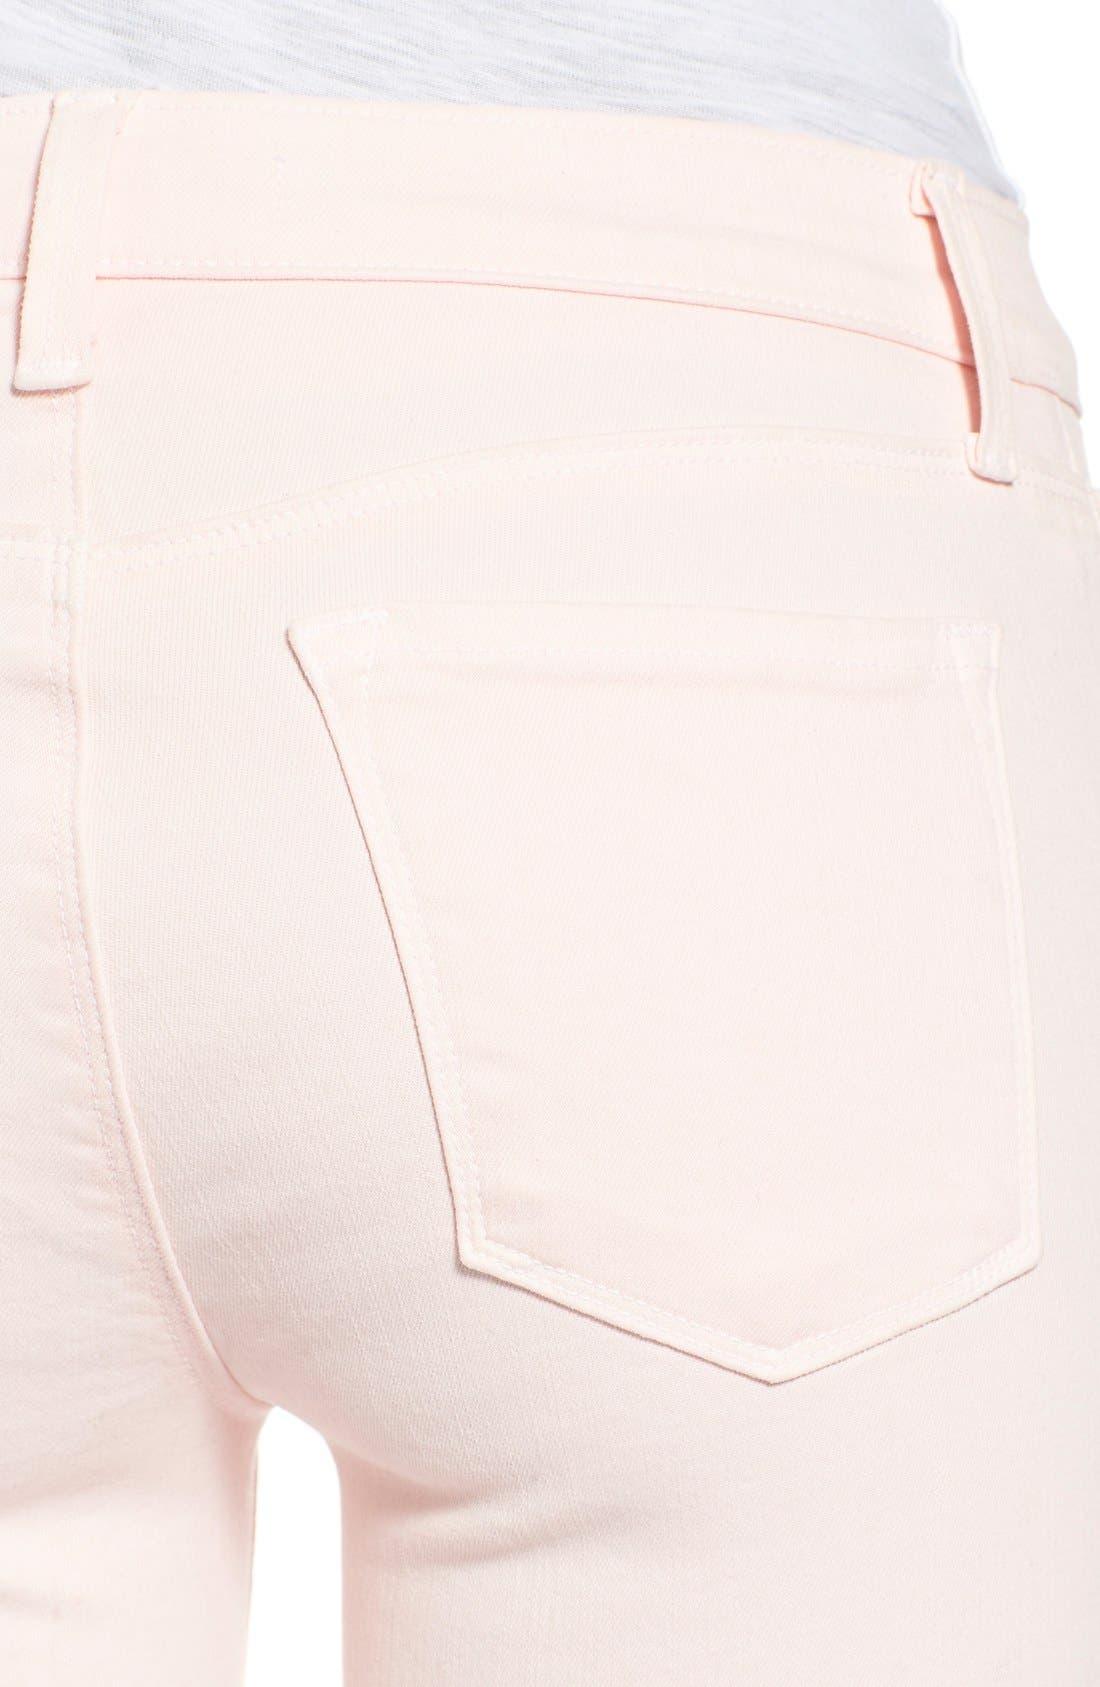 J BRAND,                             'Little Pink Jean' Low RiseCropSkinny Jeans,                             Alternate thumbnail 5, color,                             650